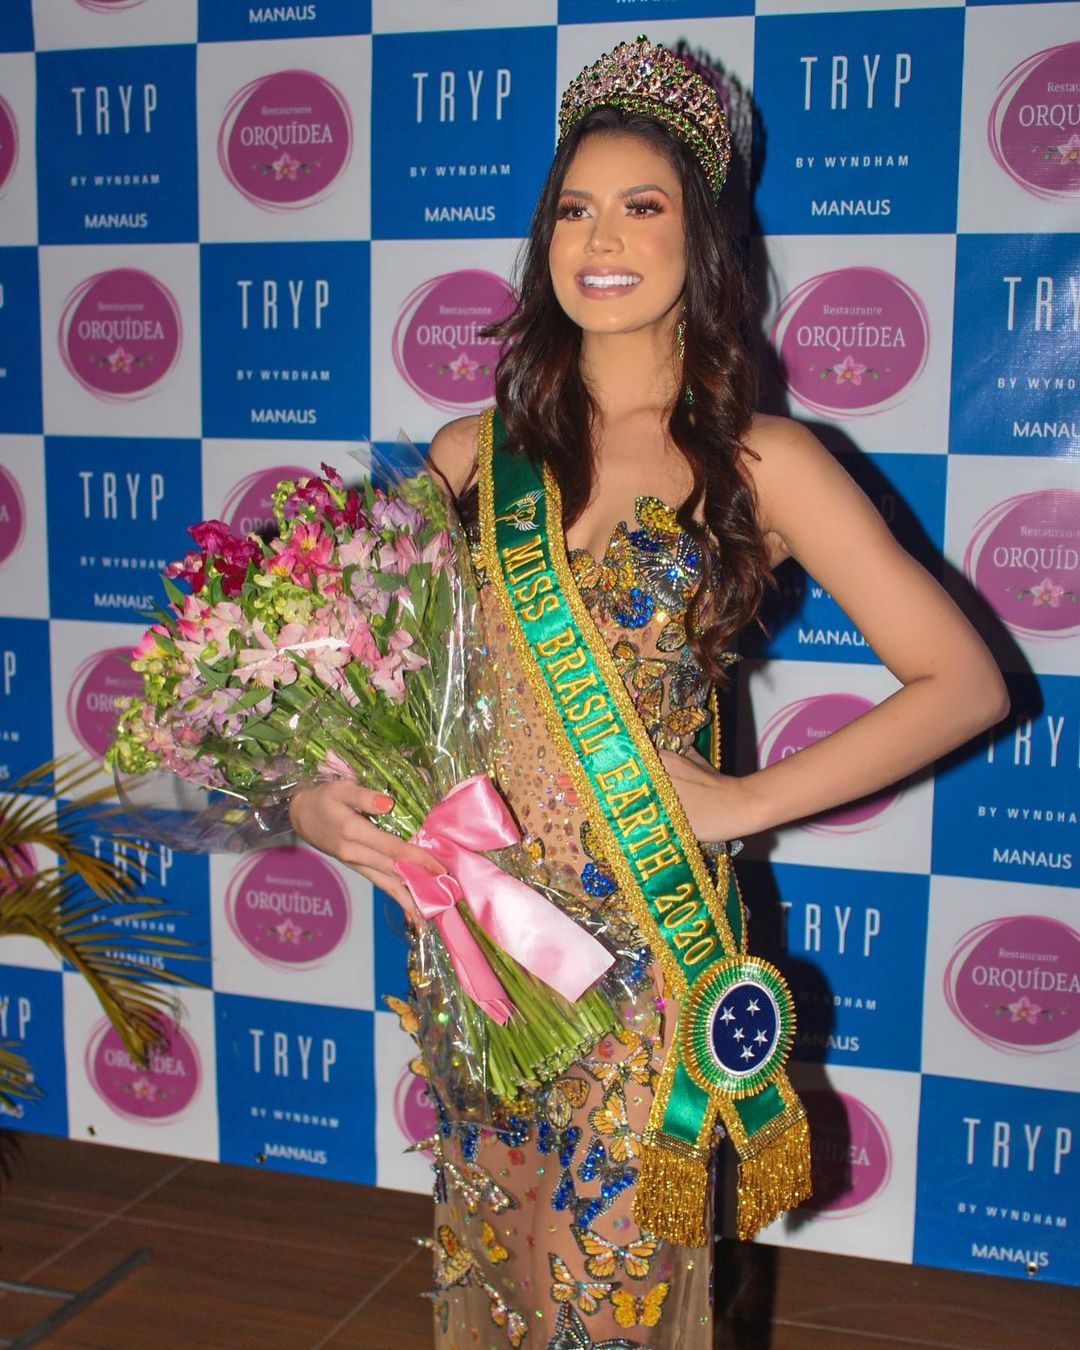 thais bergamini, miss terra brasil 2020. Thaisb18